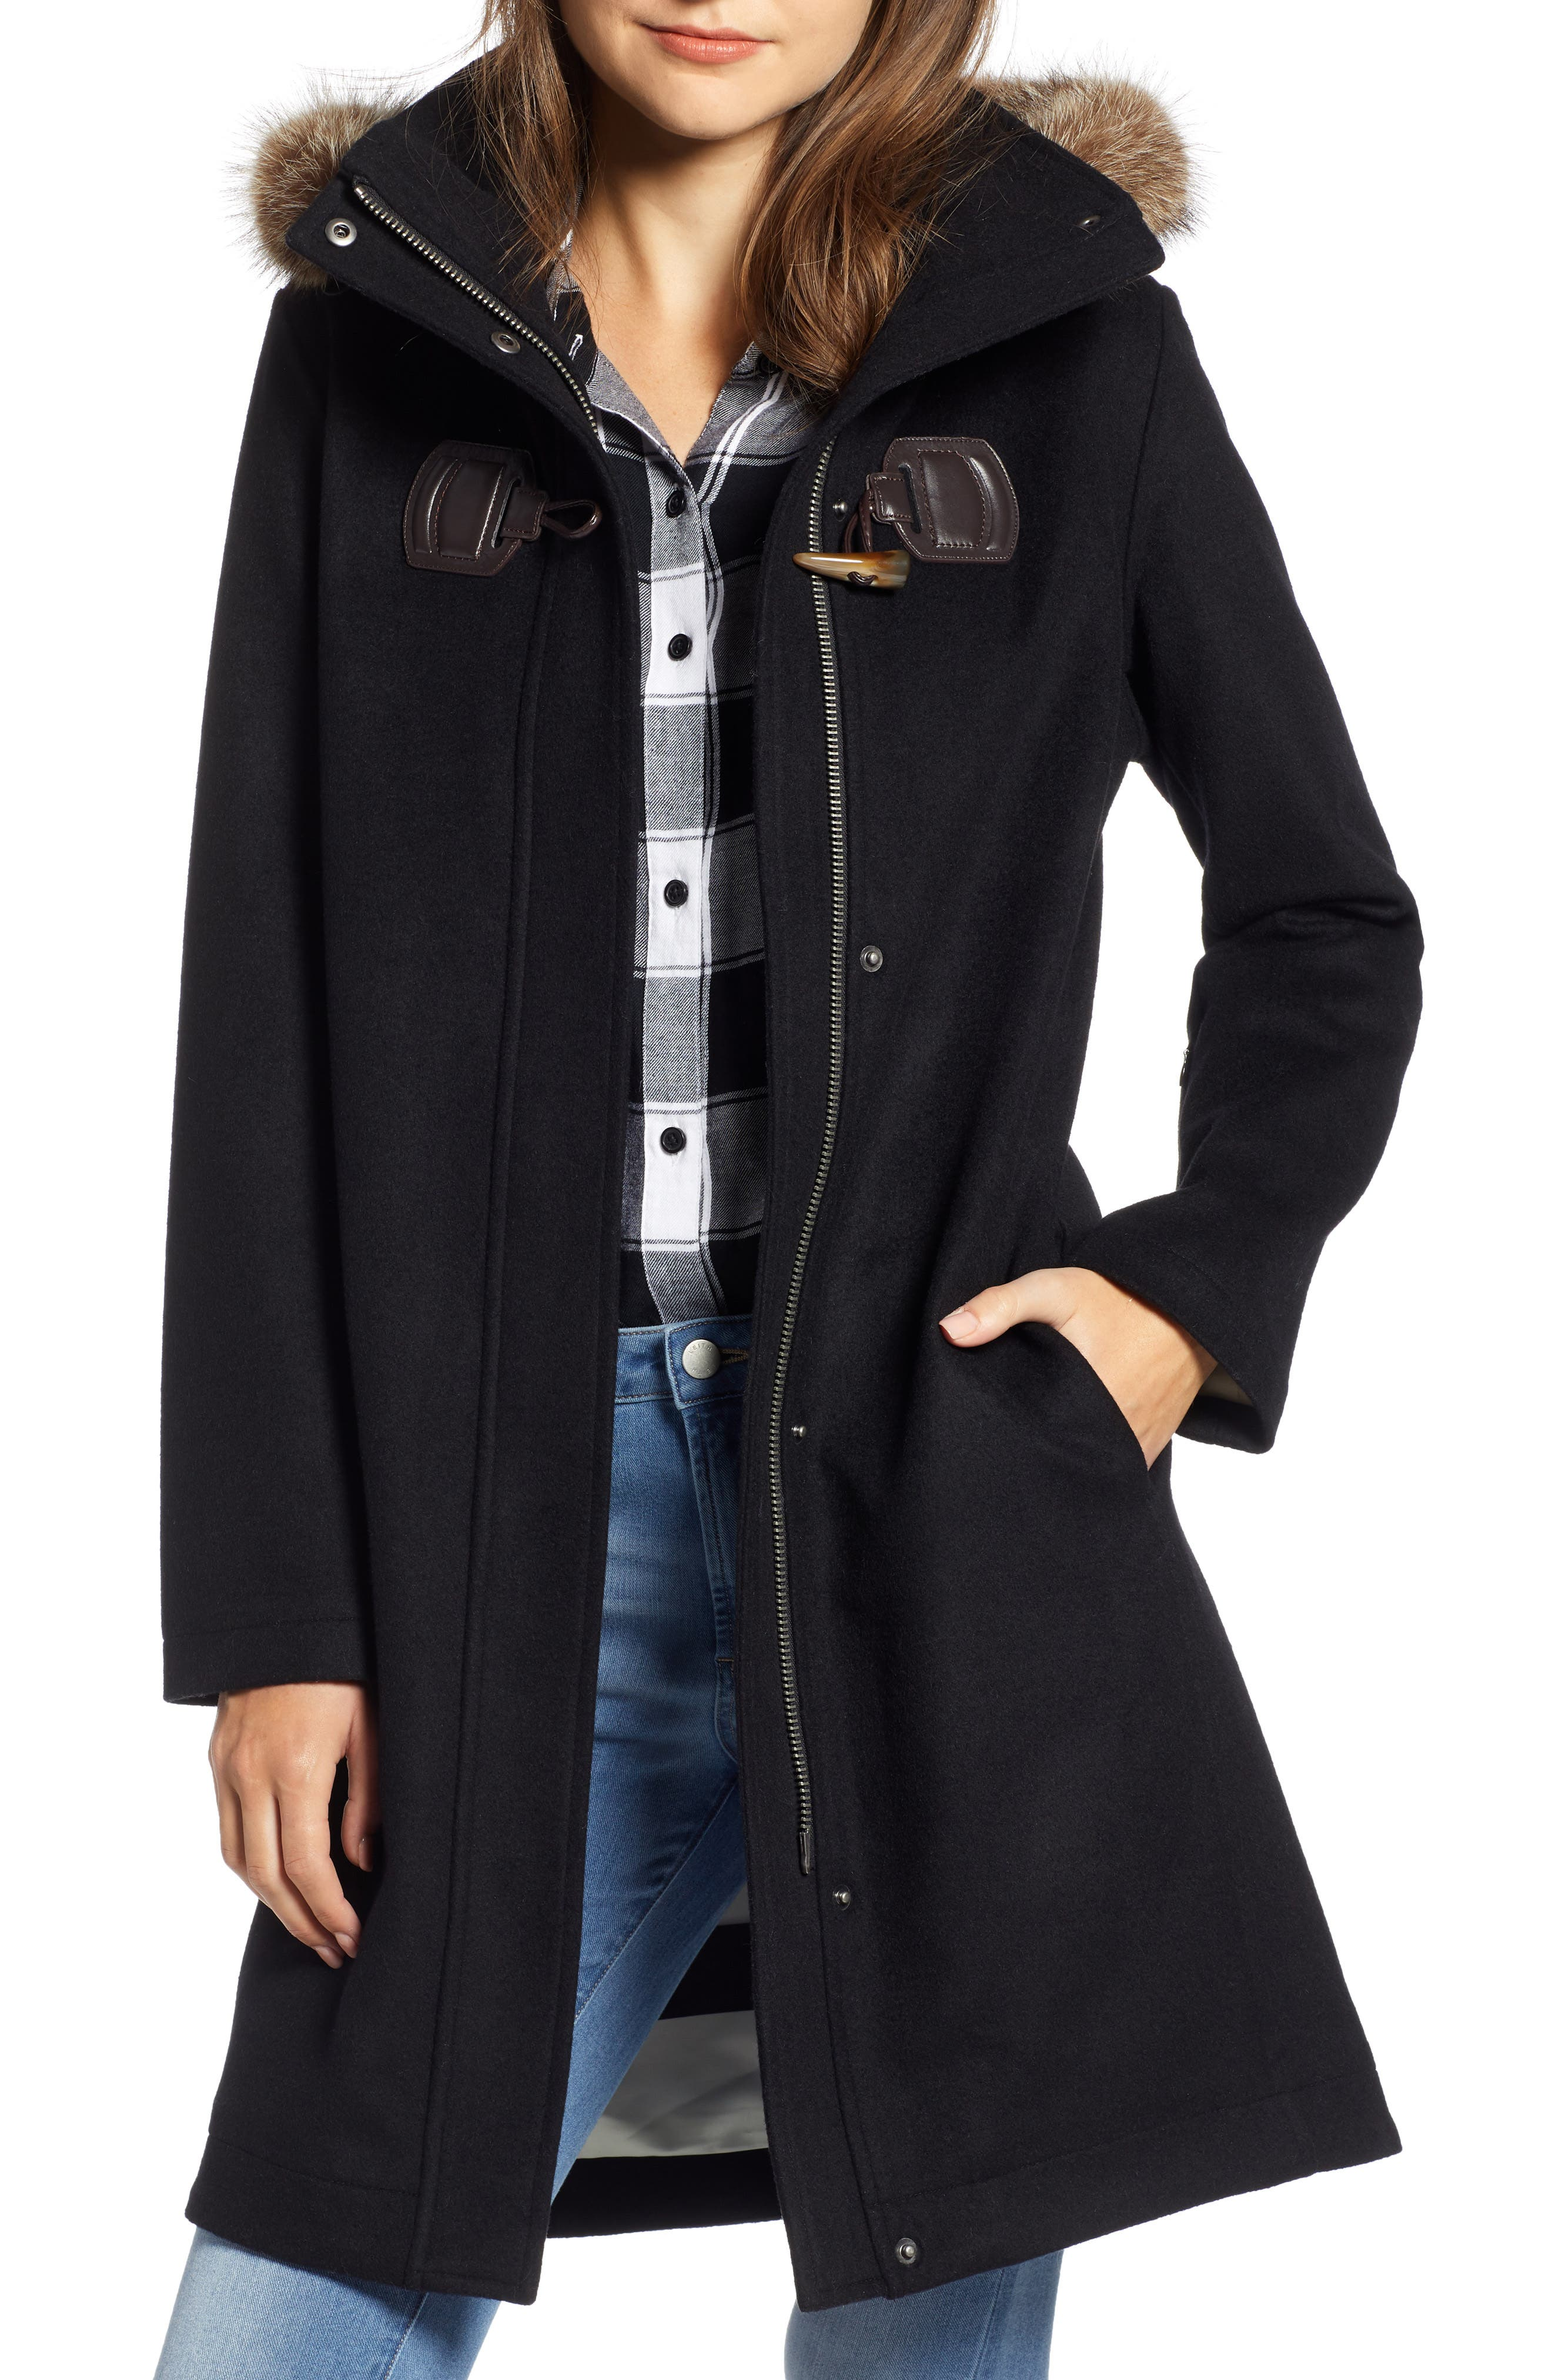 St Marie Wool Hooded Coat with Genuine Raccoon Fur Trim,                             Main thumbnail 1, color,                             BLACK